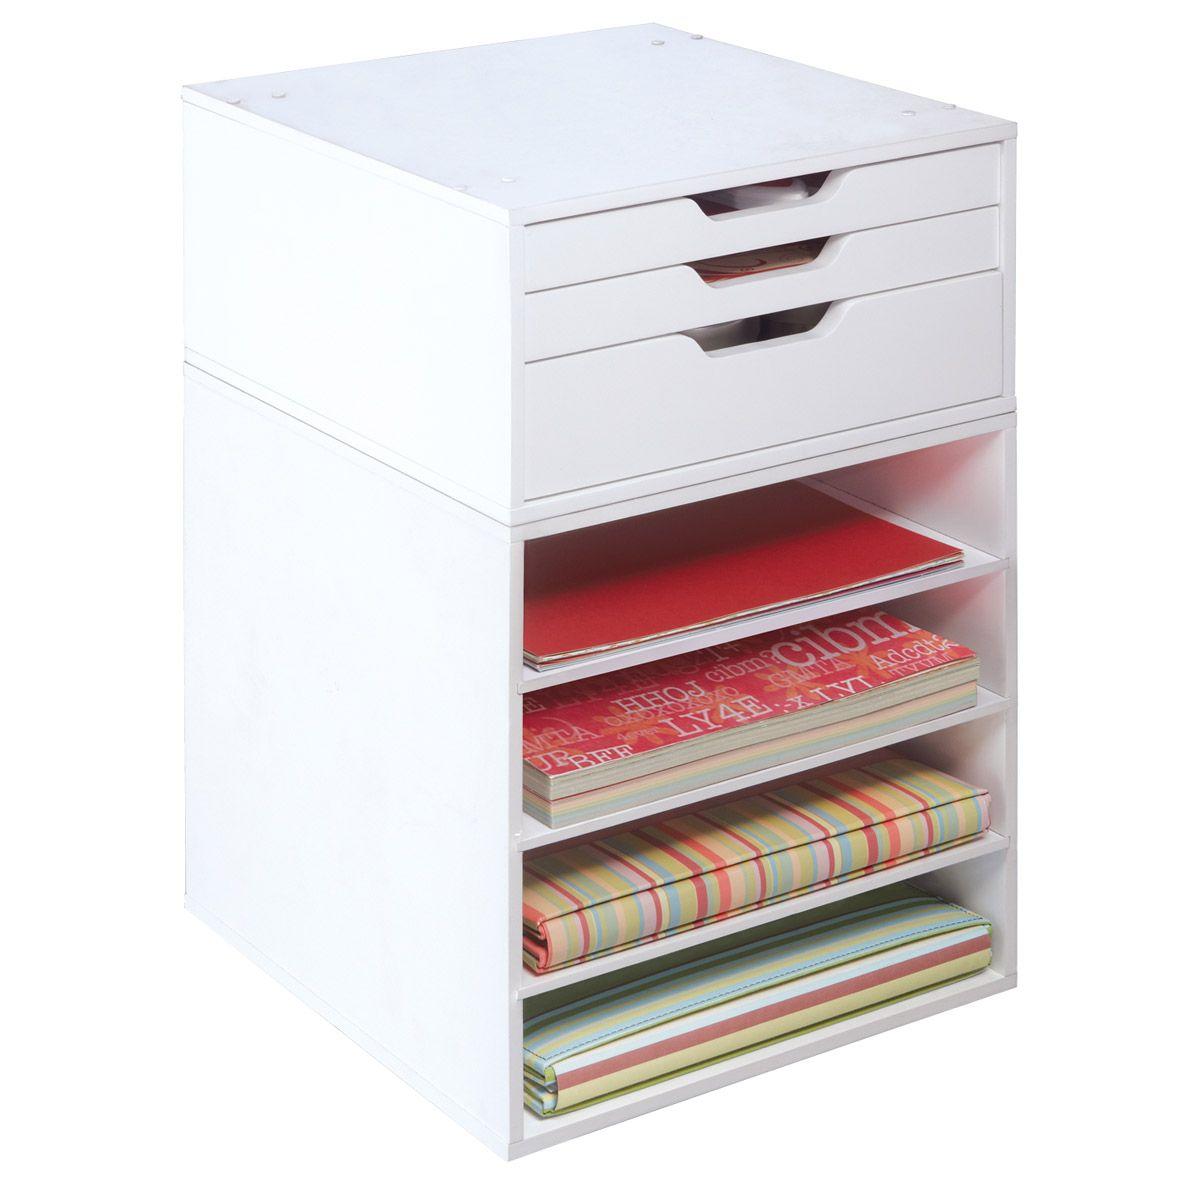 Scrapbooking Michaels Stores Shop Online 24 7 Paper Storage Craft Room Office Craft Room Storage